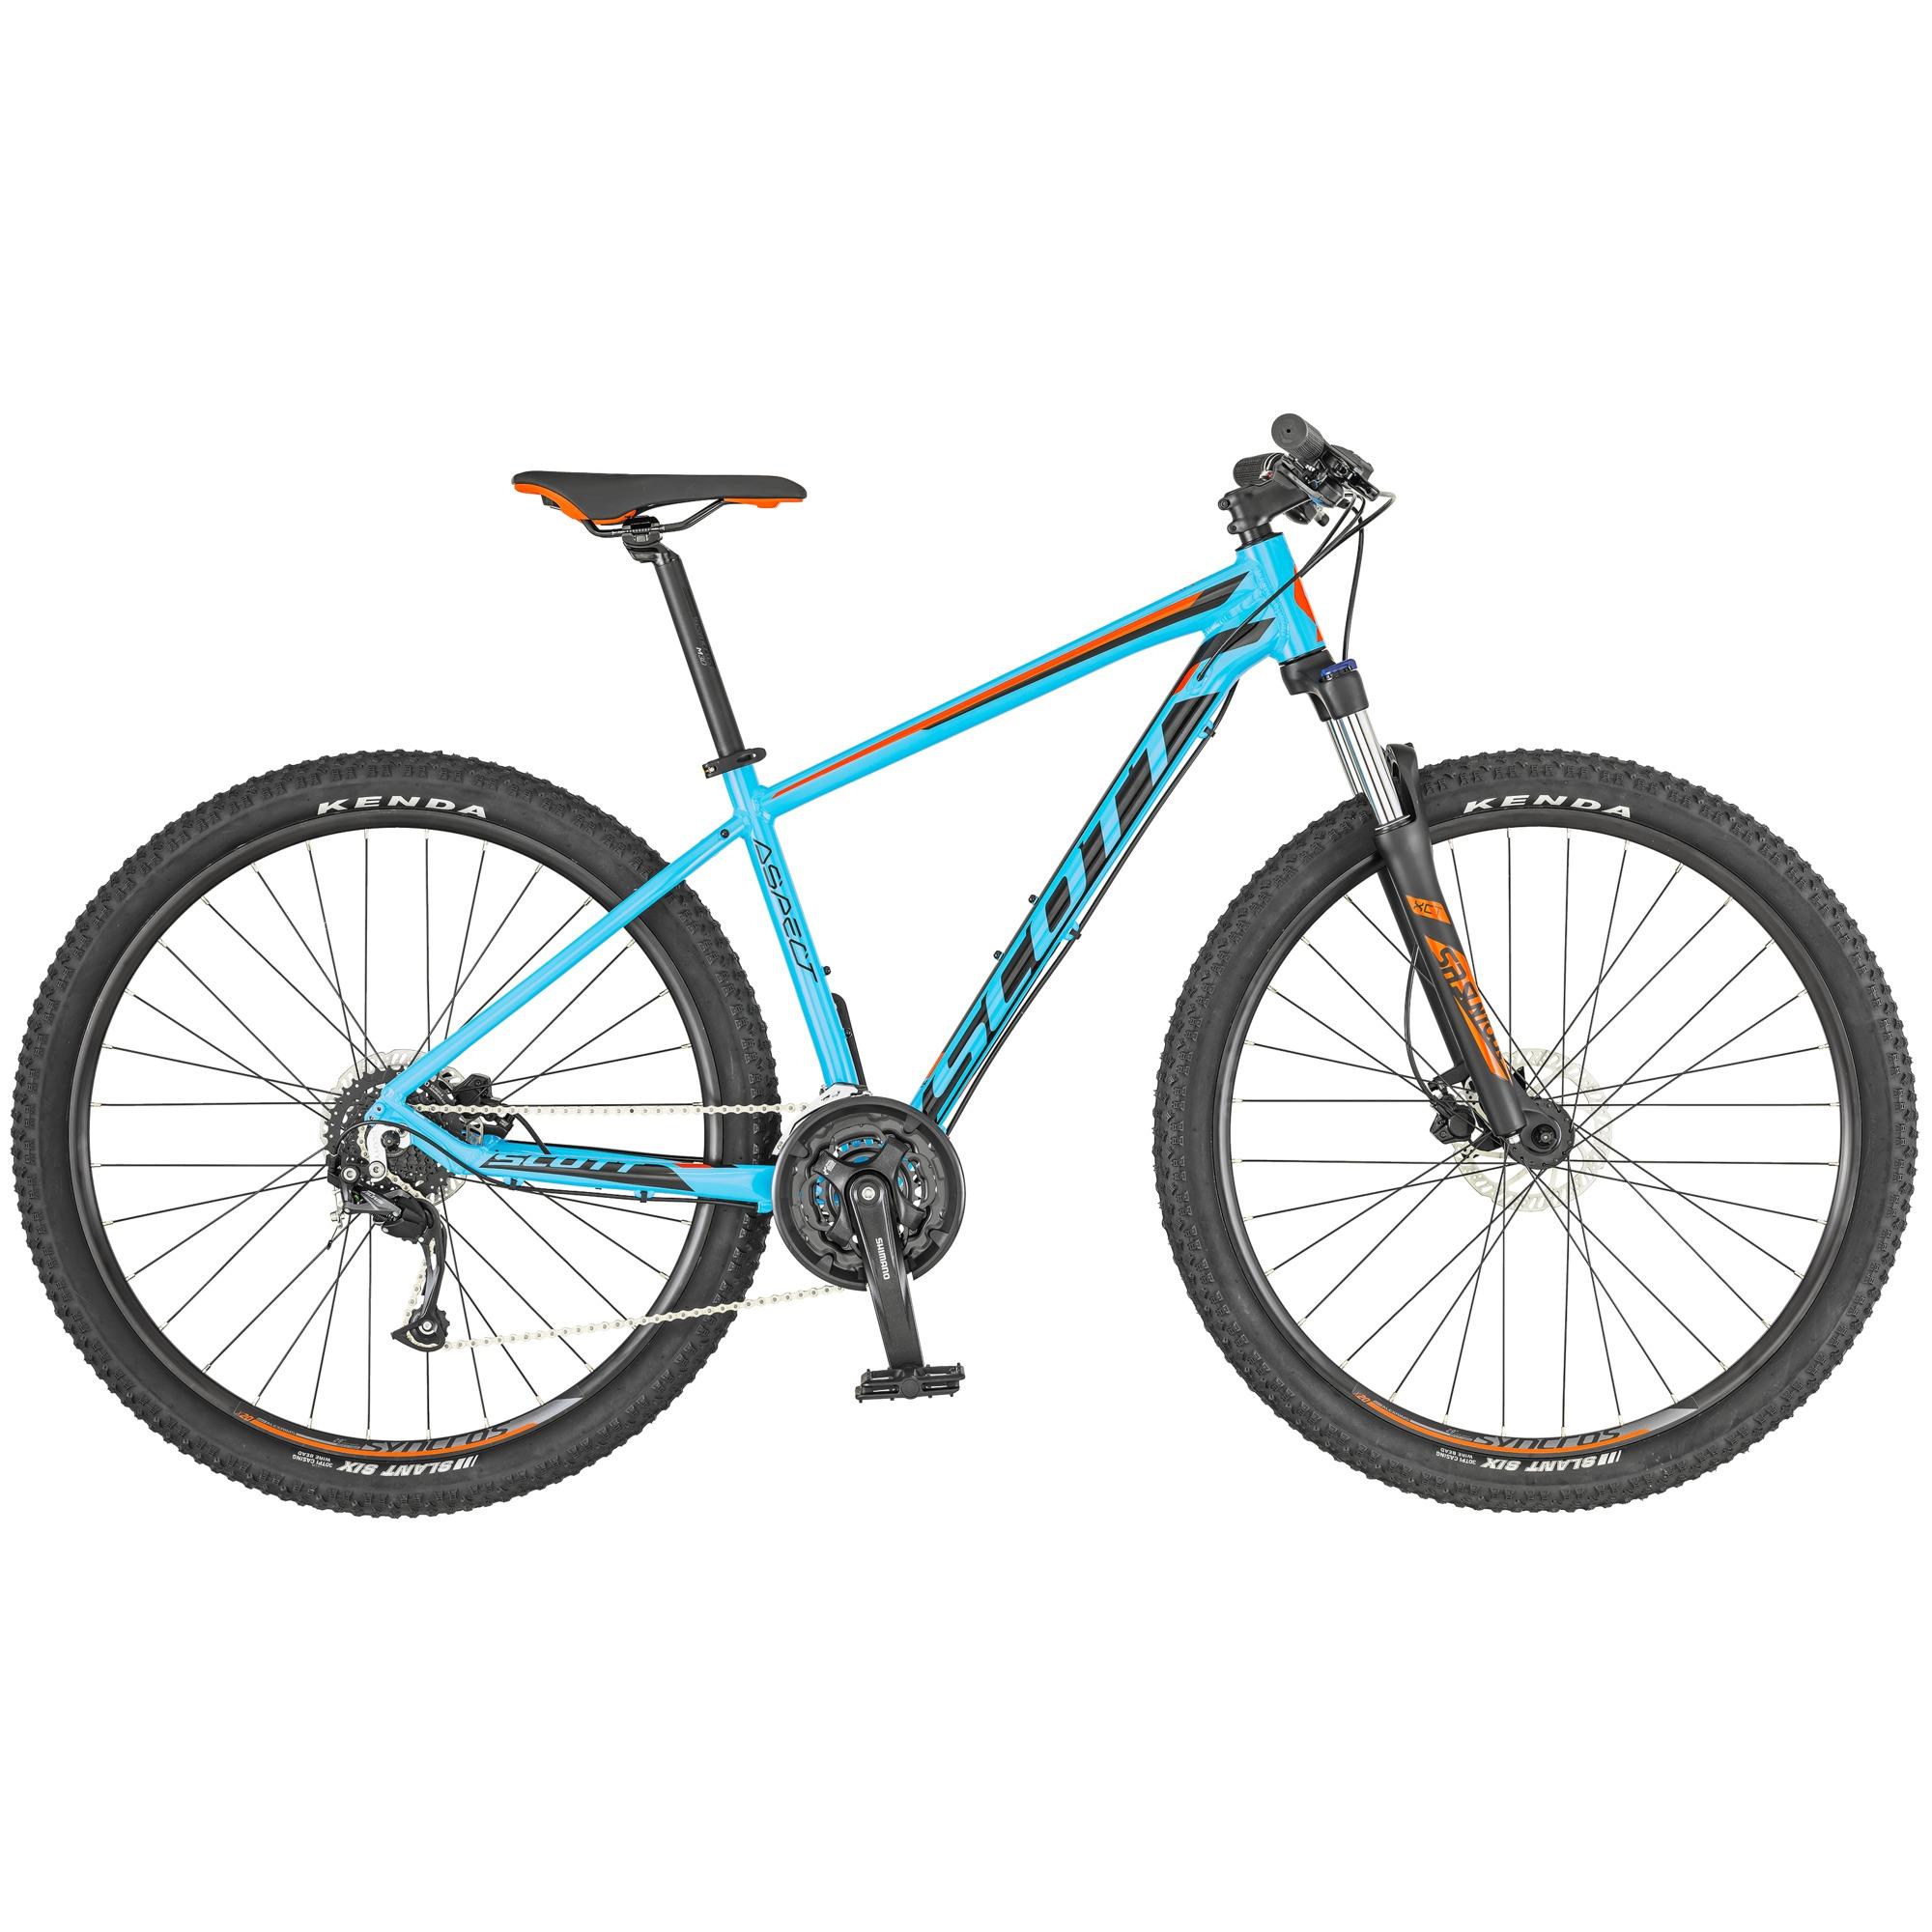 SCOTT Aspect 750 Light blue/Red Bike M - Fahrrad online kaufen | Online Shop Bike Profis